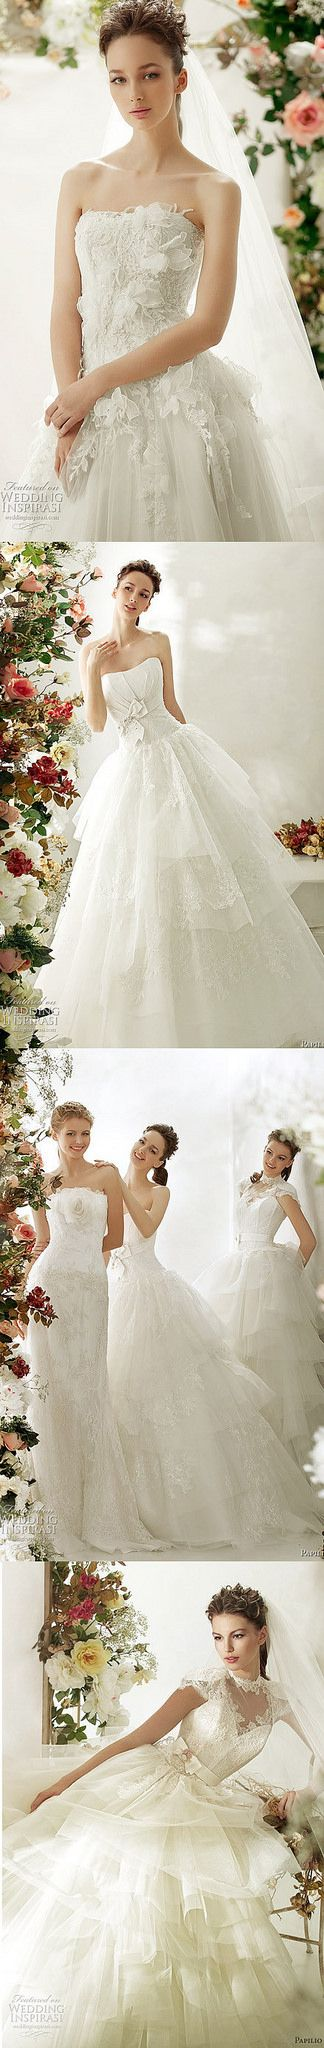 Korte trouwjurken